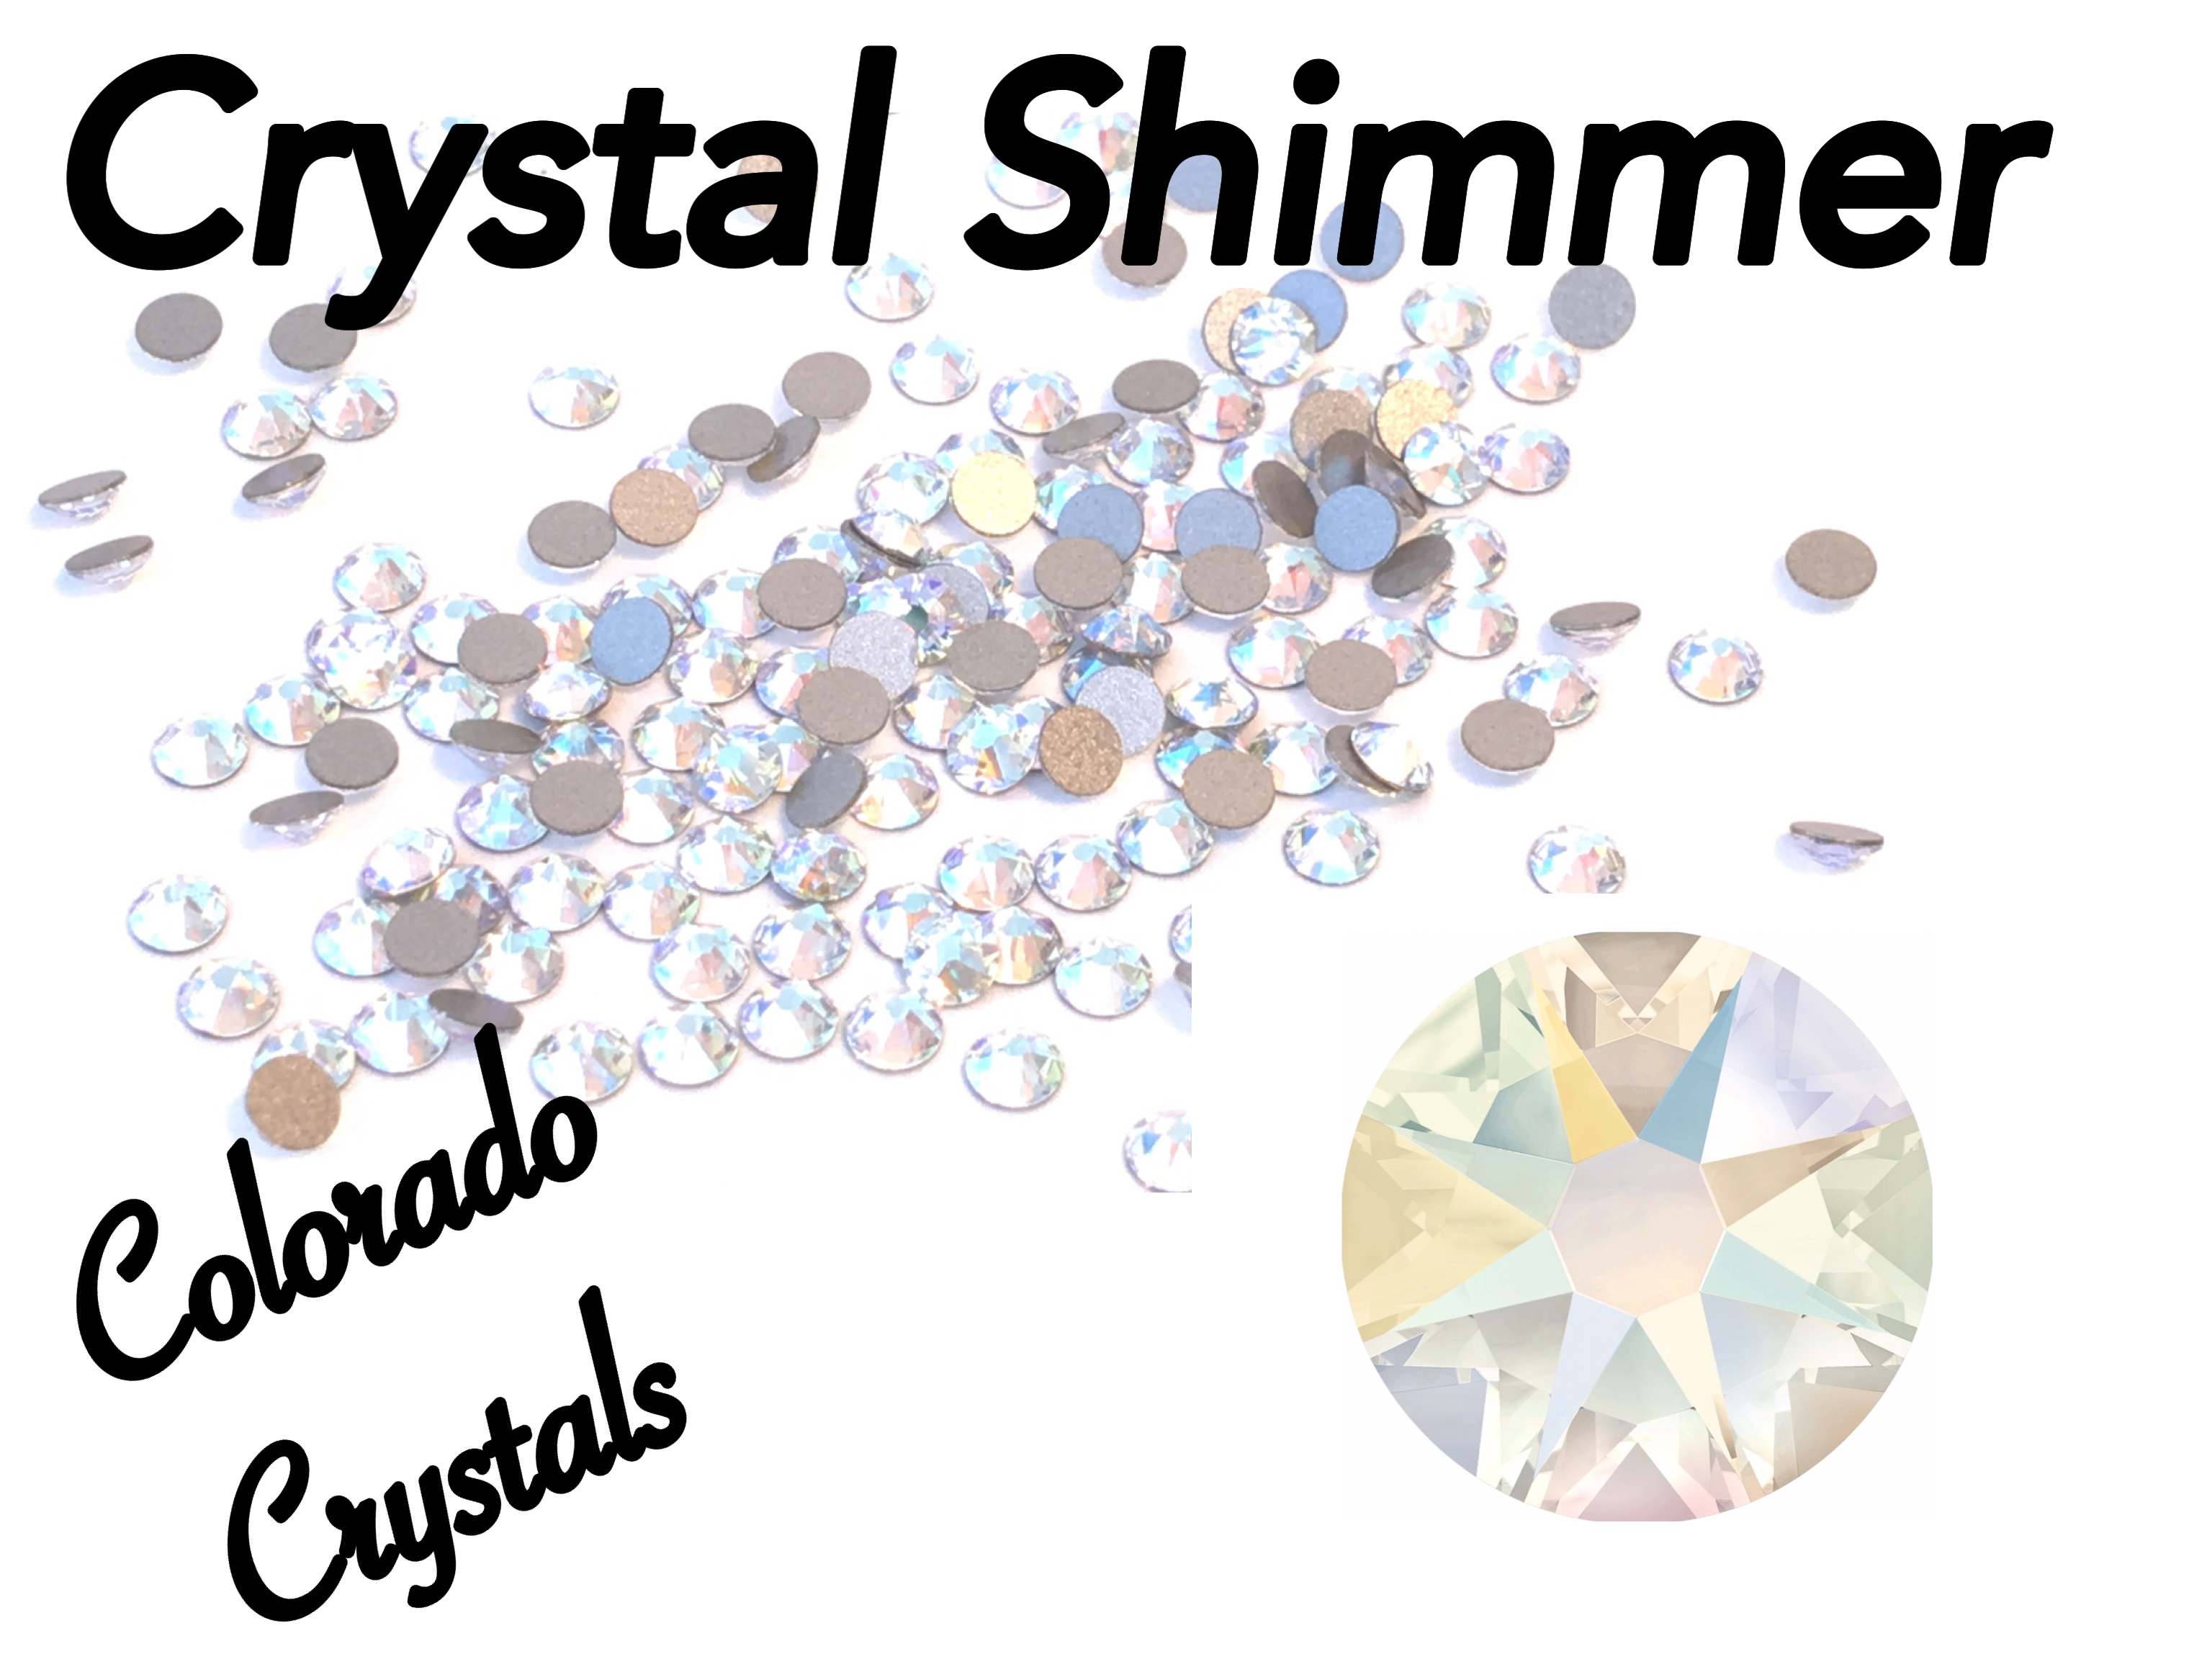 Crystal Shimmer 2088 Swarovski XIRIUS